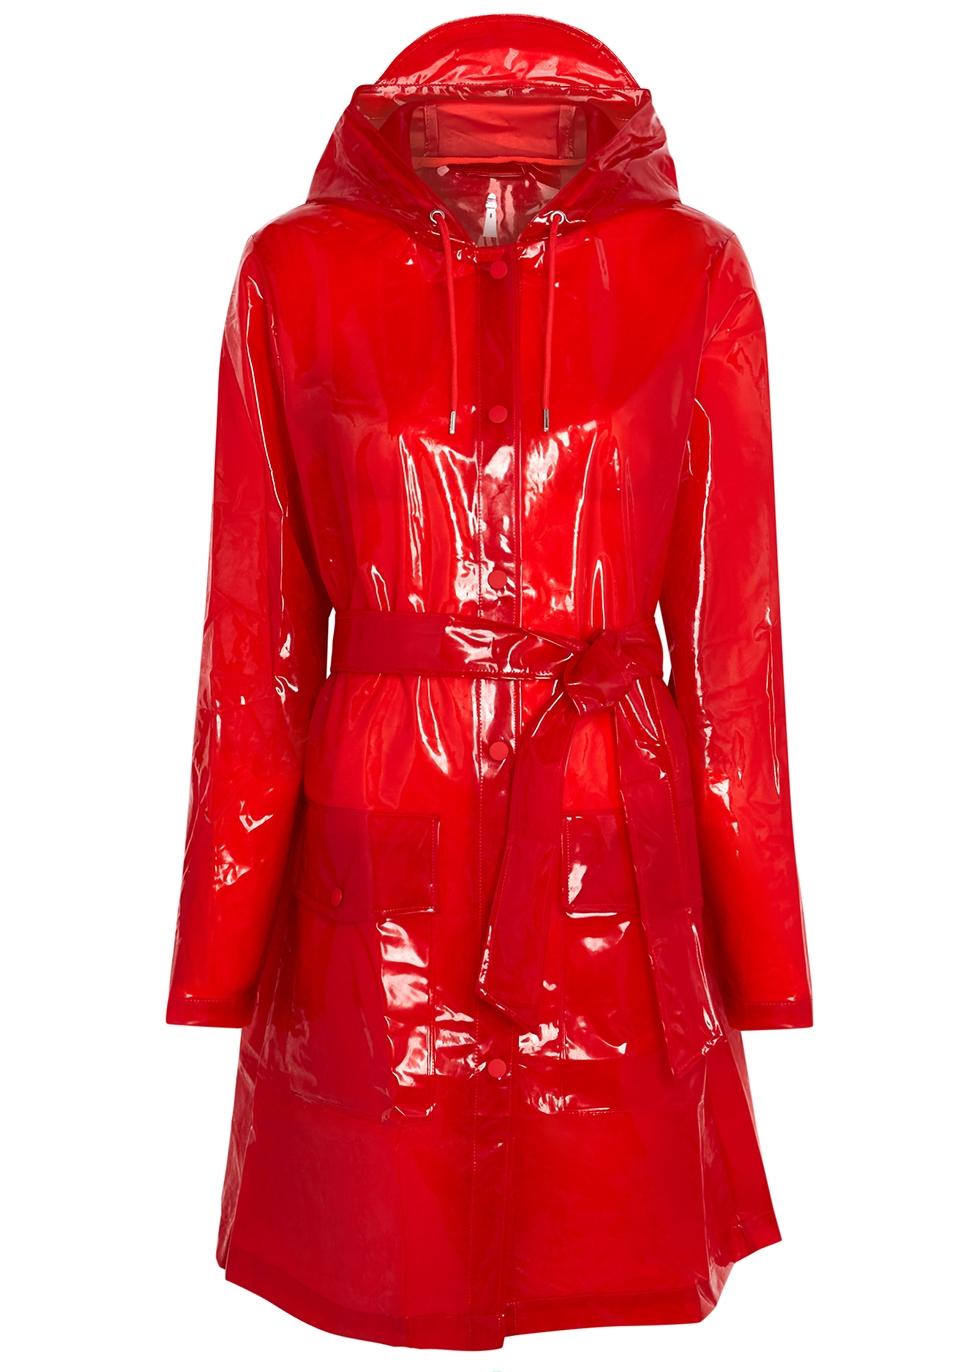 Red sheer rubberised raincoat